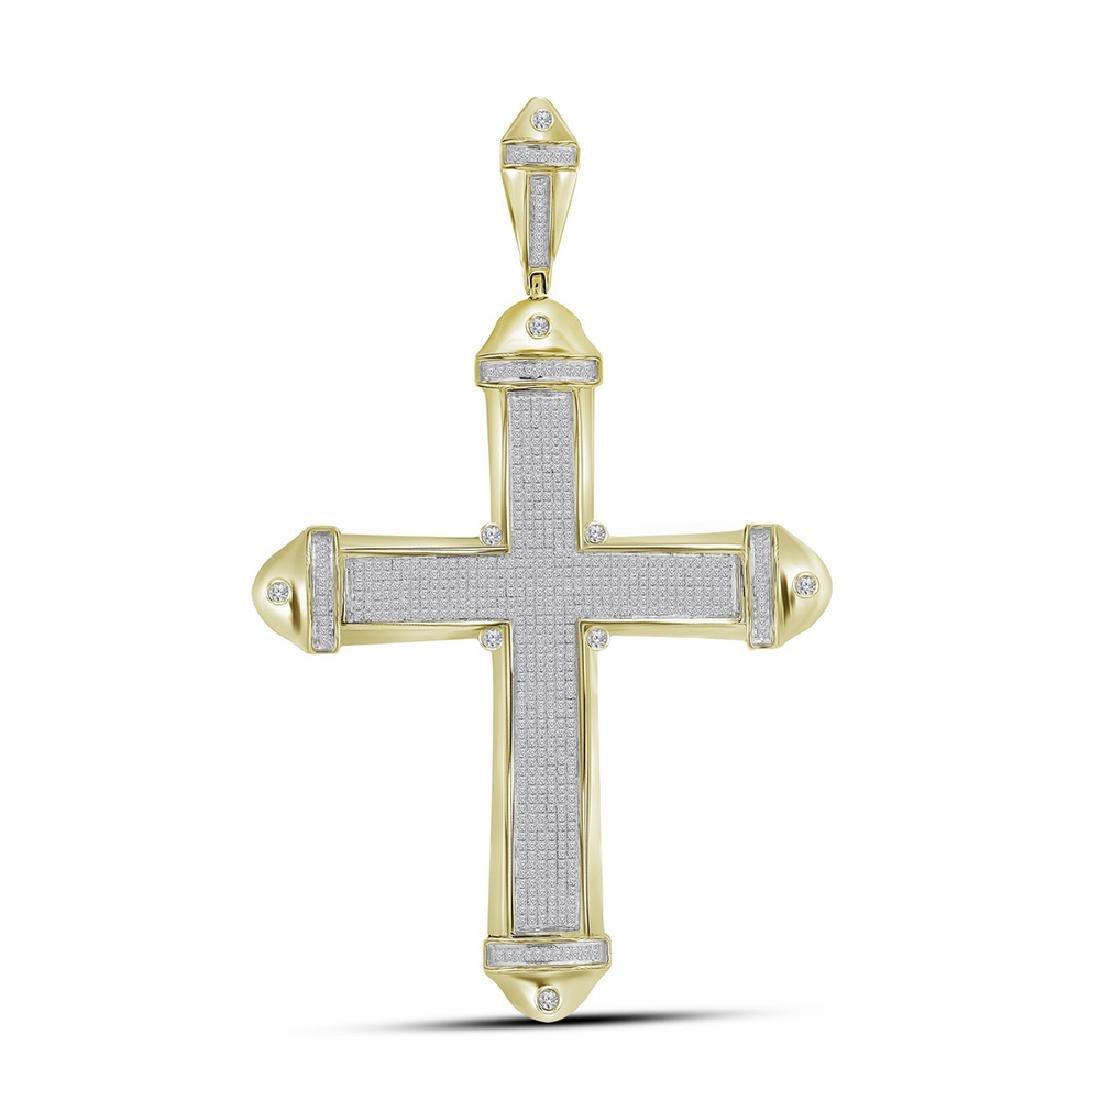 1.56 CTW Mens Pave-set Diamond Cross Crucifix Charm